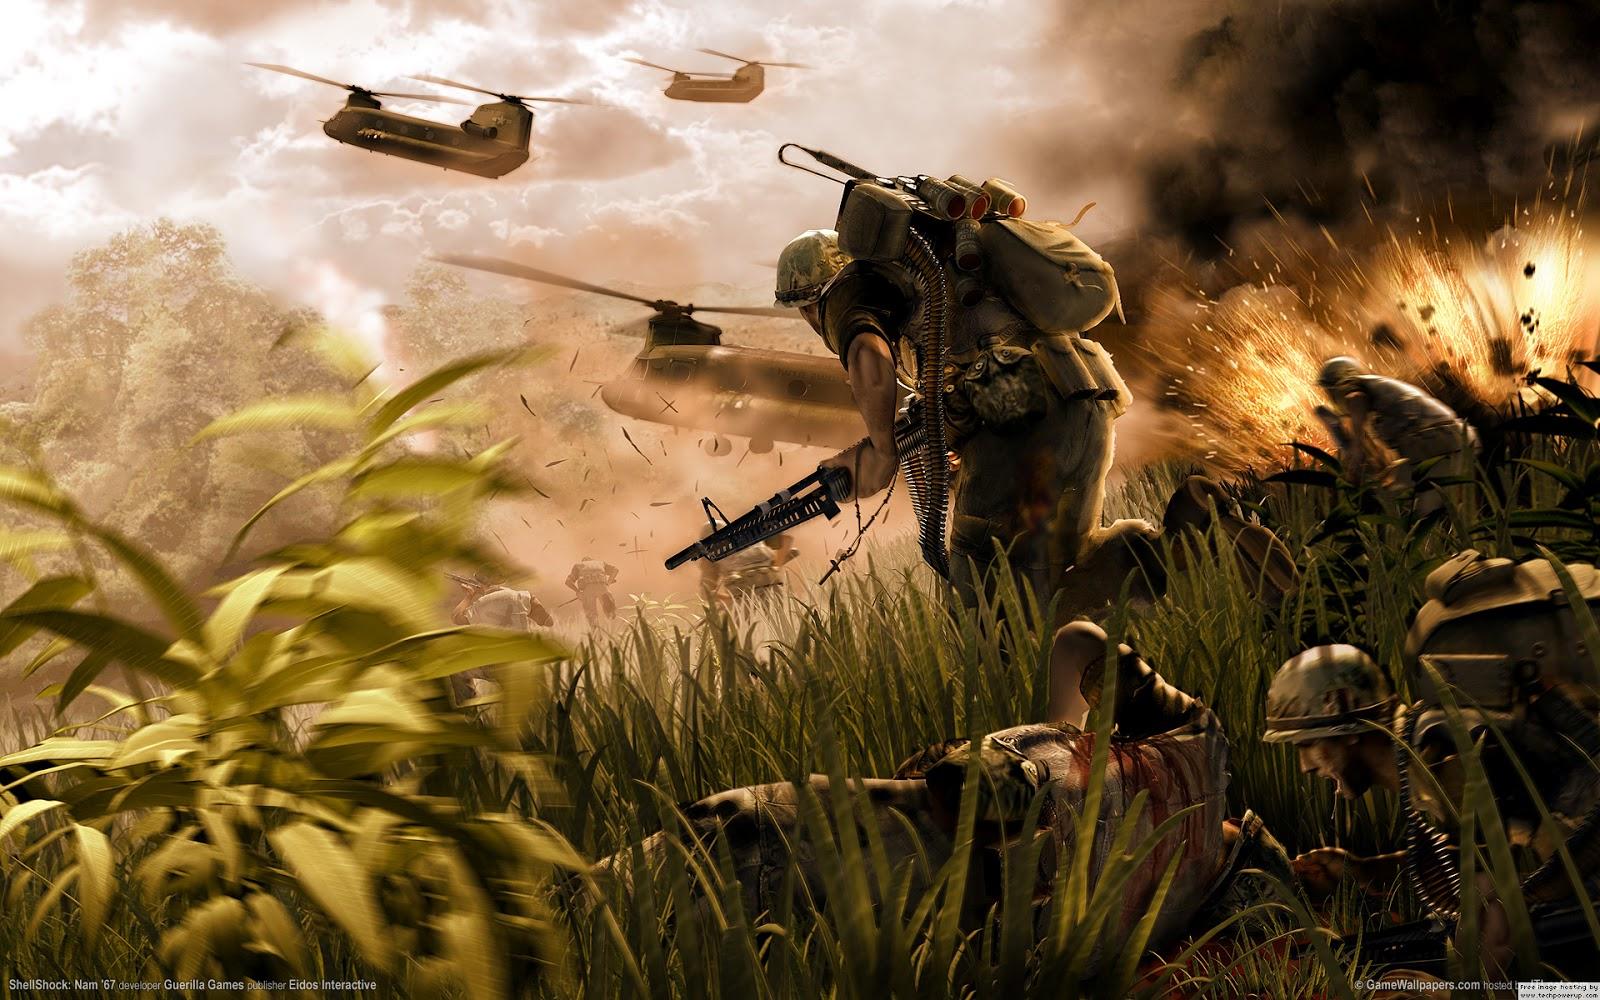 Download Vietnam war picture [1600x1000] 49 Vietnam War 1600x1000